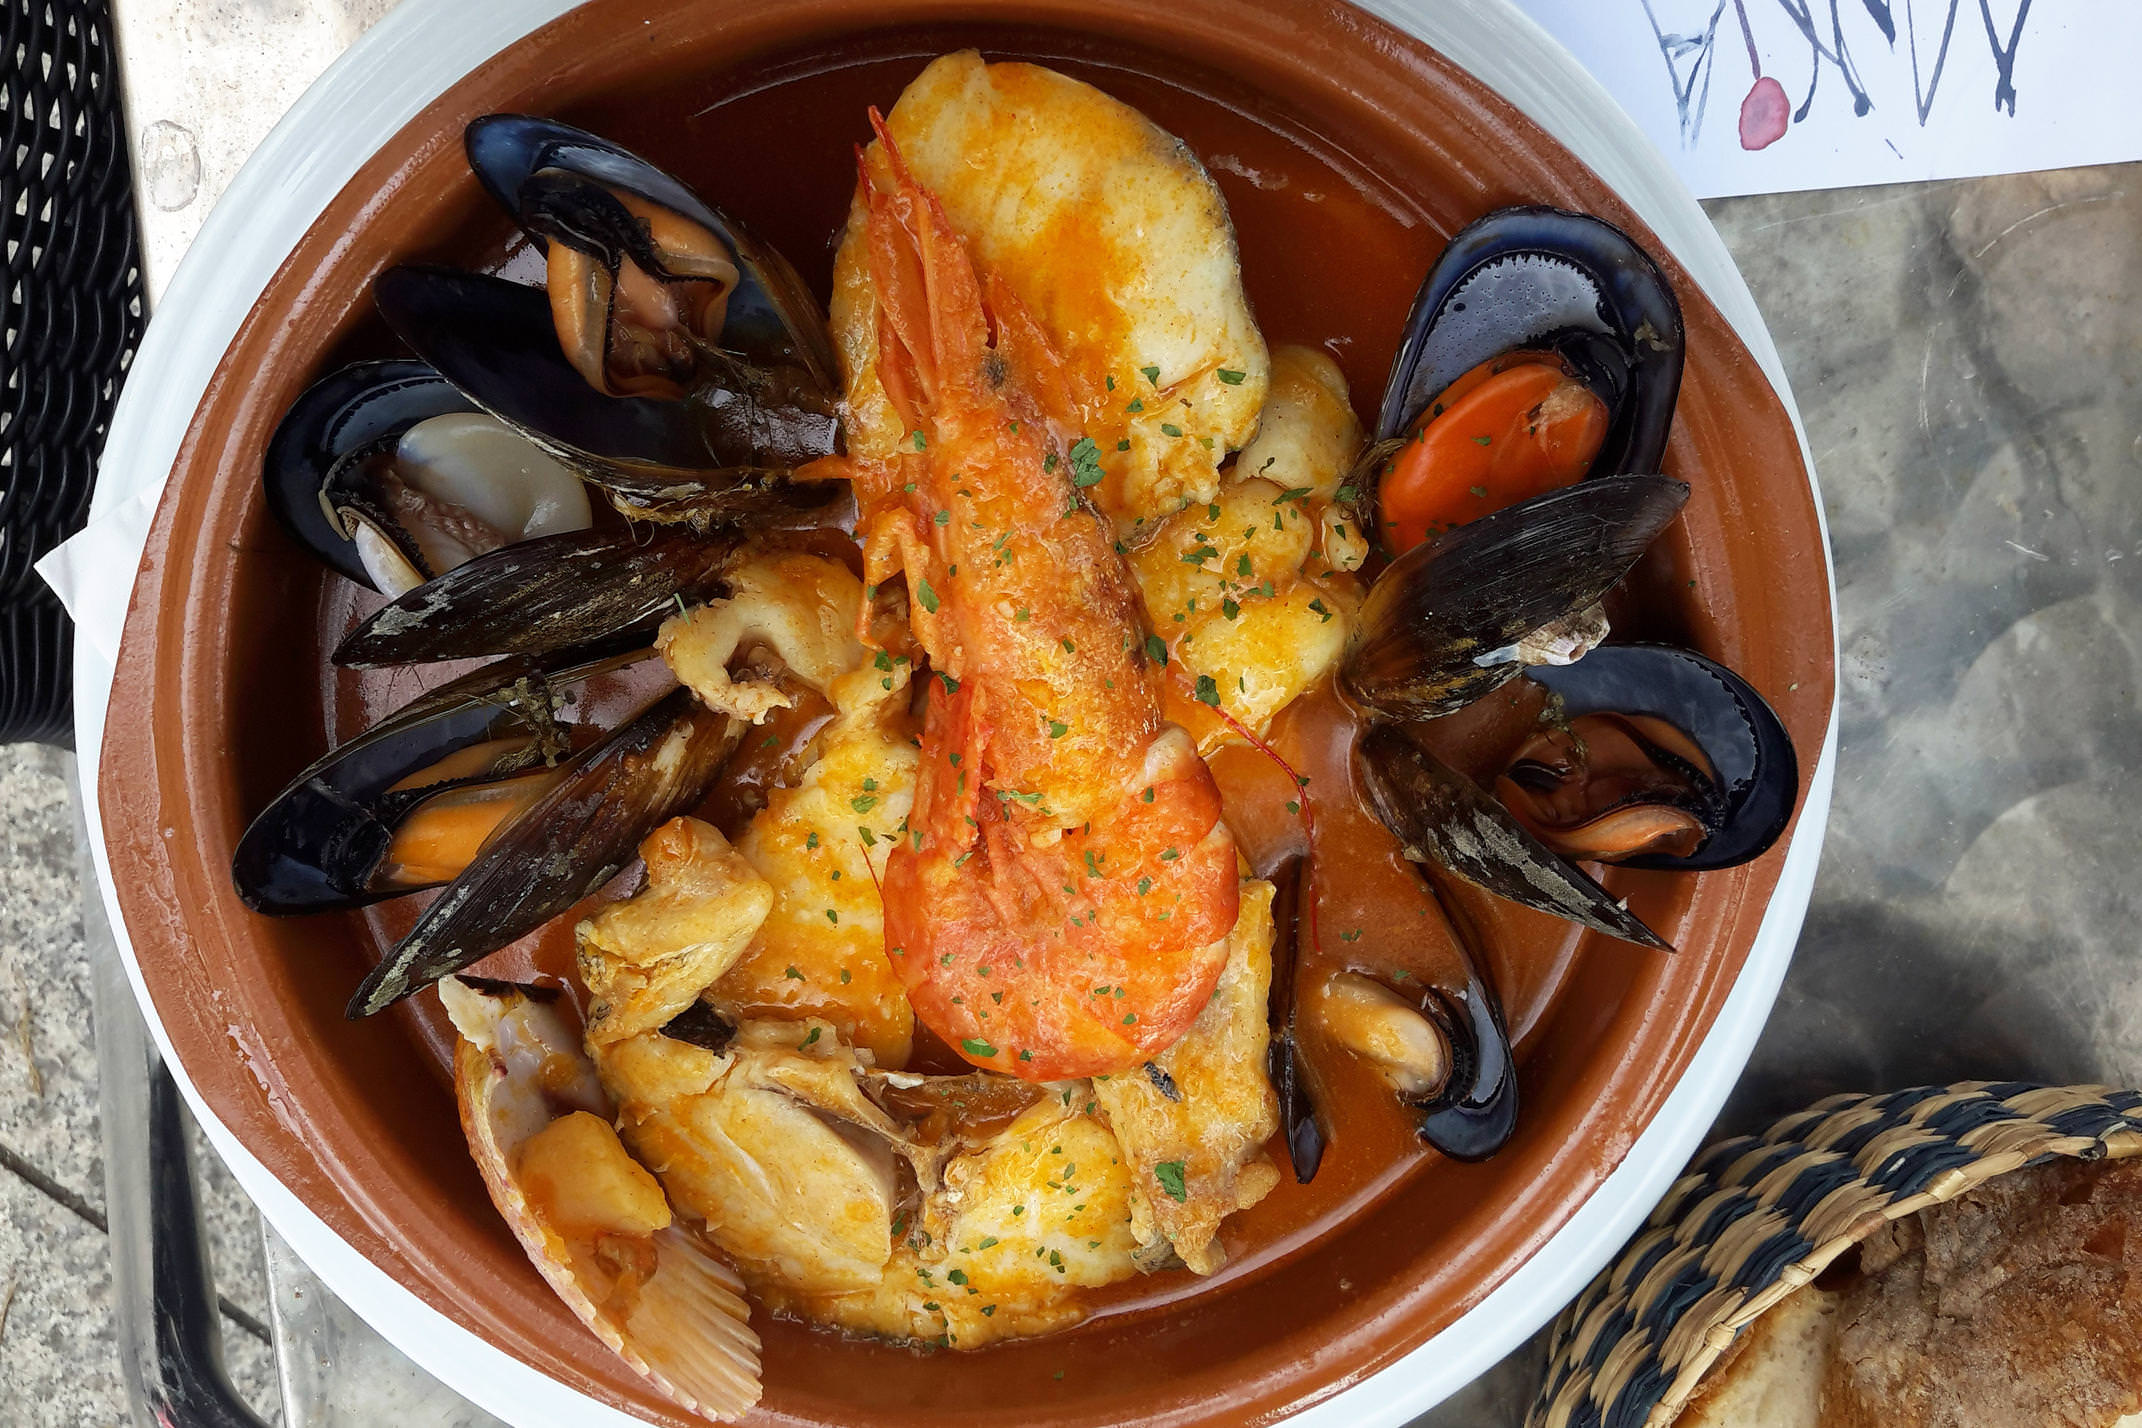 Spain galicia camino costa da morte muxia seafood